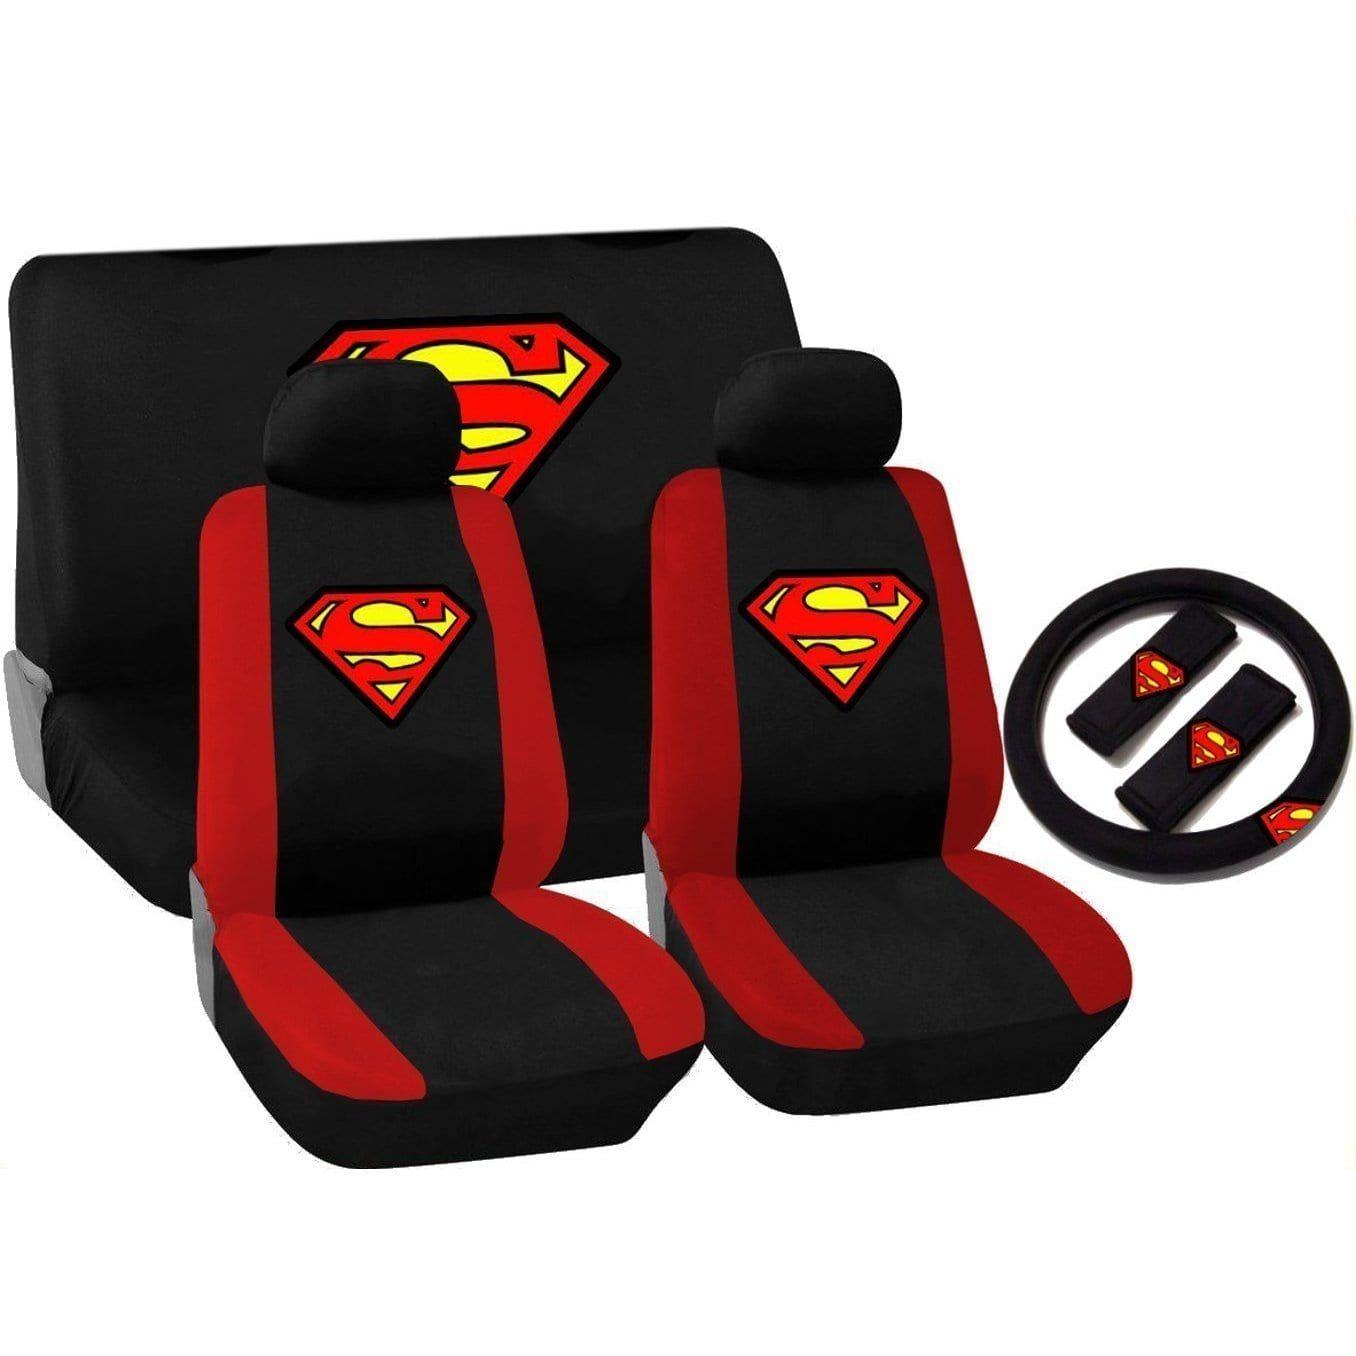 11pcs Black Amp Red Superman Logo Seat Cover Set Scion Cars